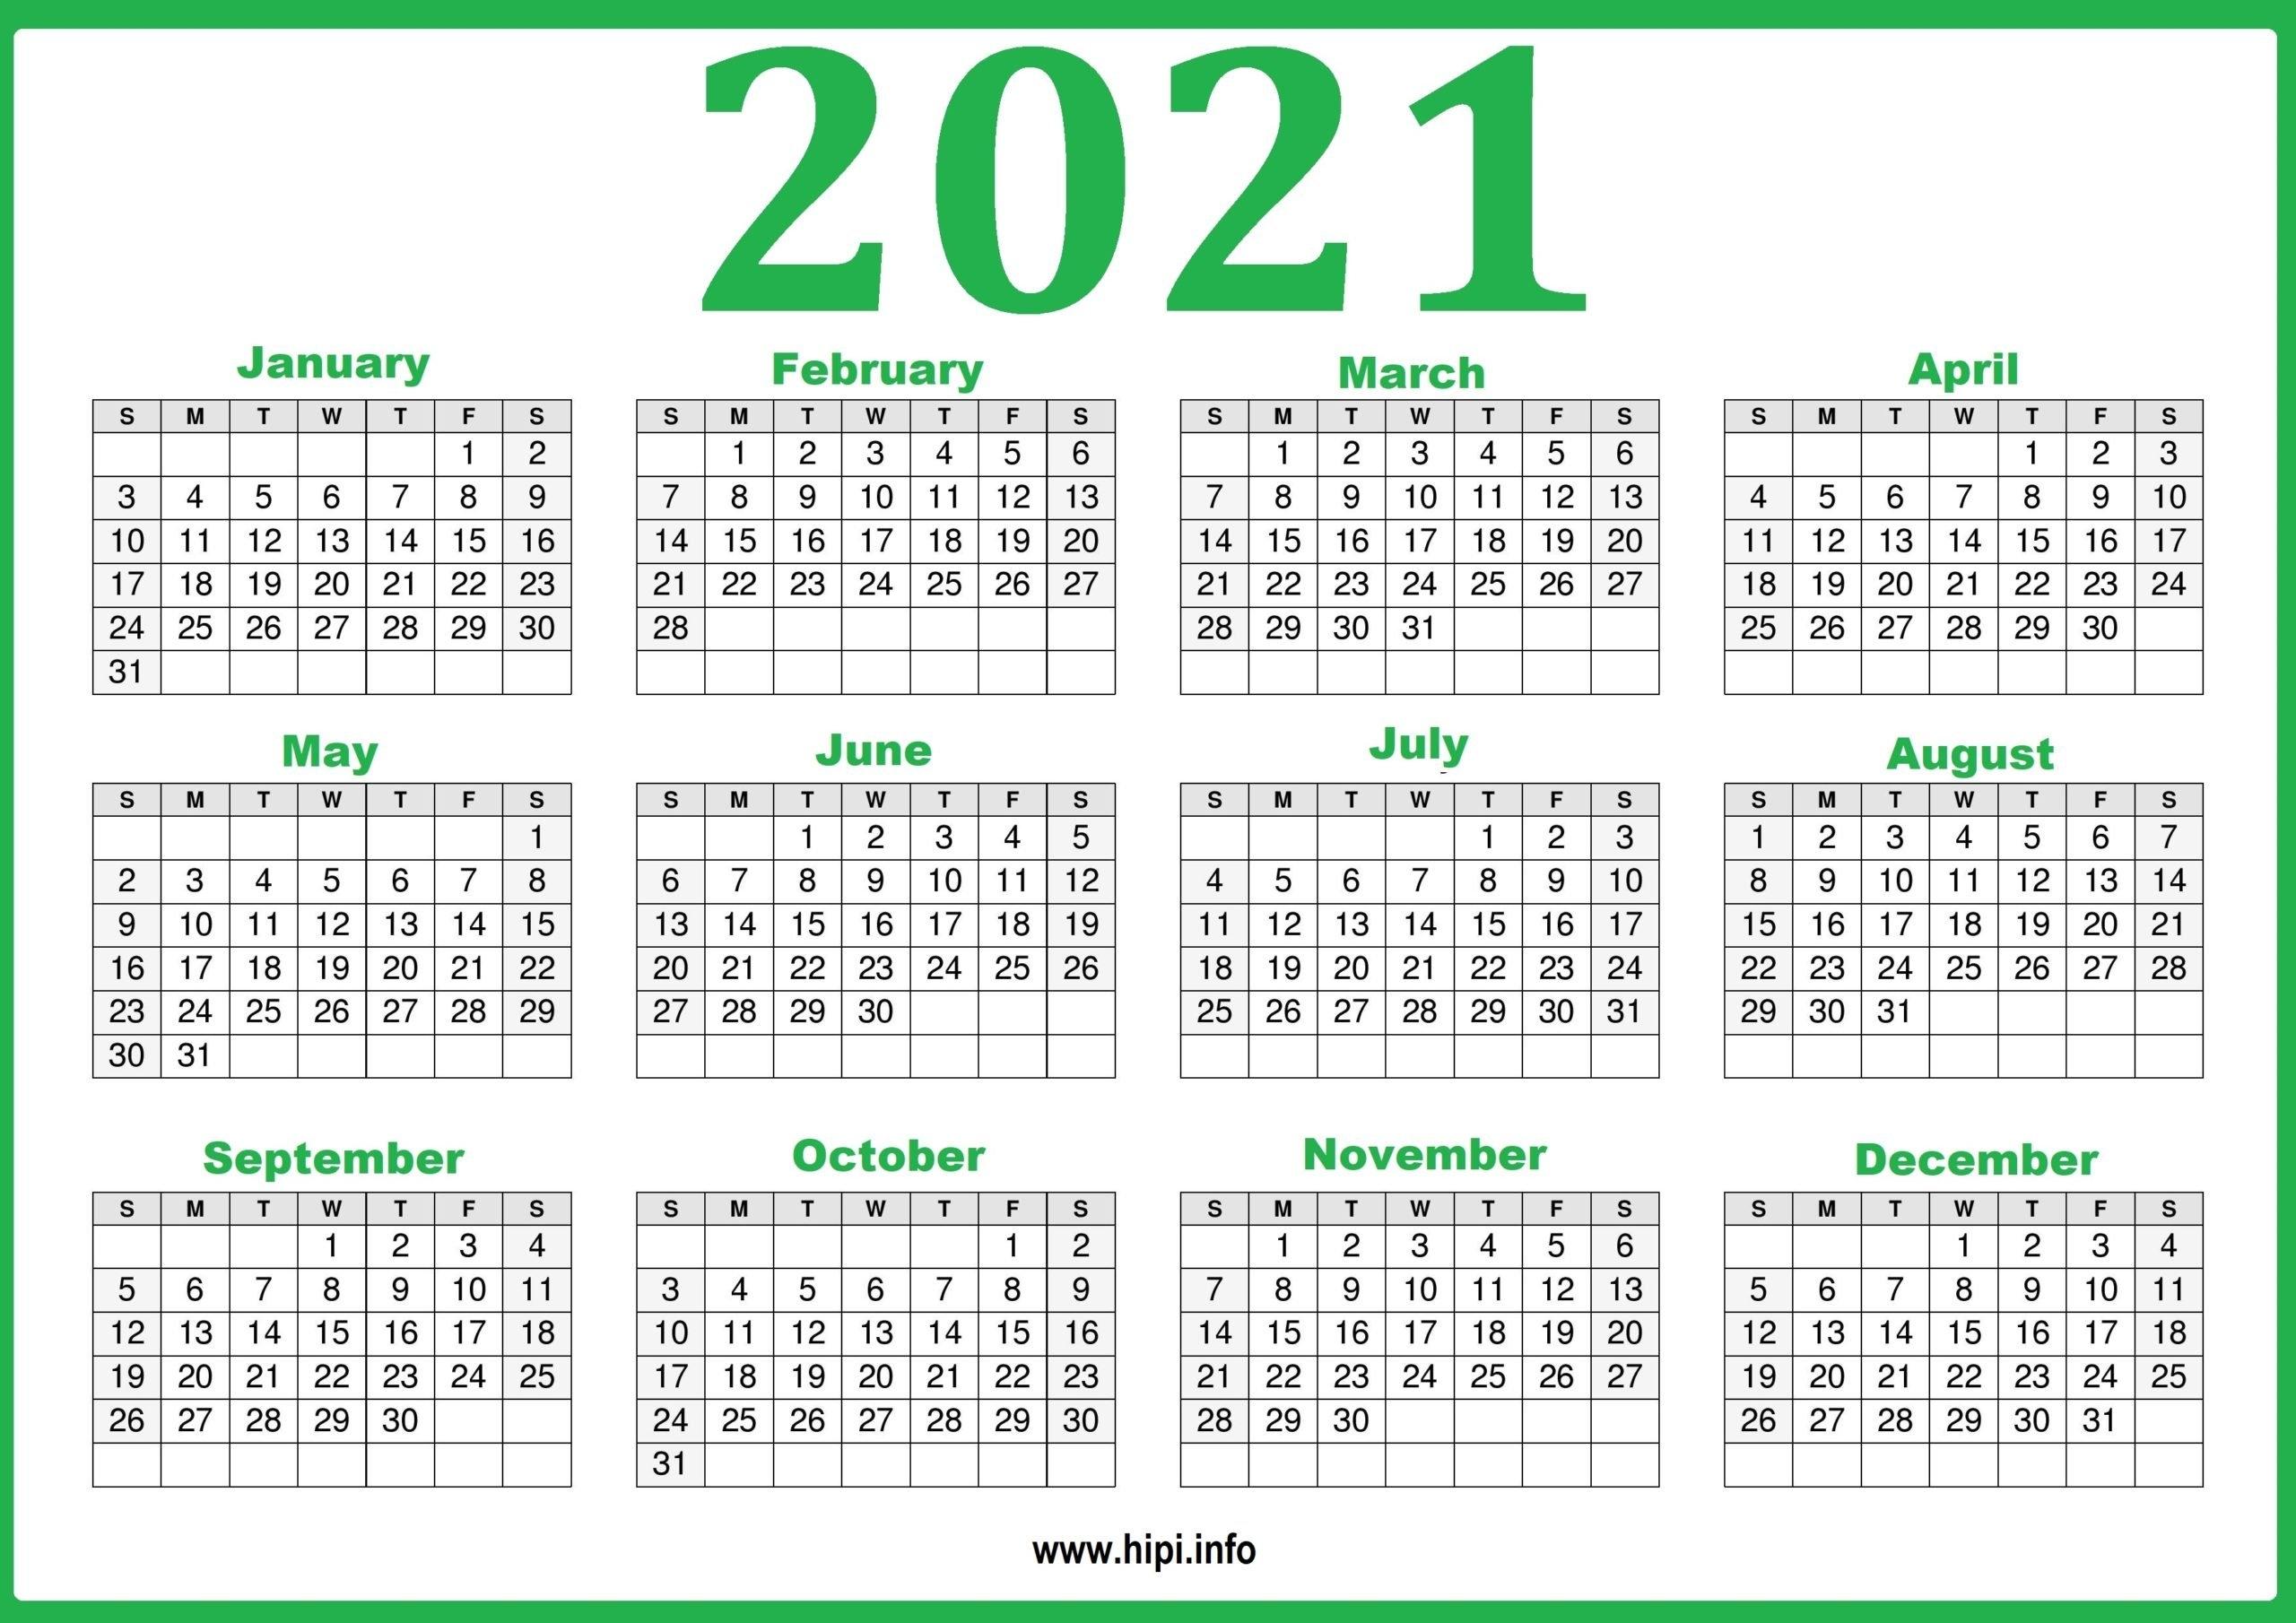 2021 Calendar Printable Yearly Template - Hipi | Calendars Printable Free within 2021 Calendar Printable Free Image